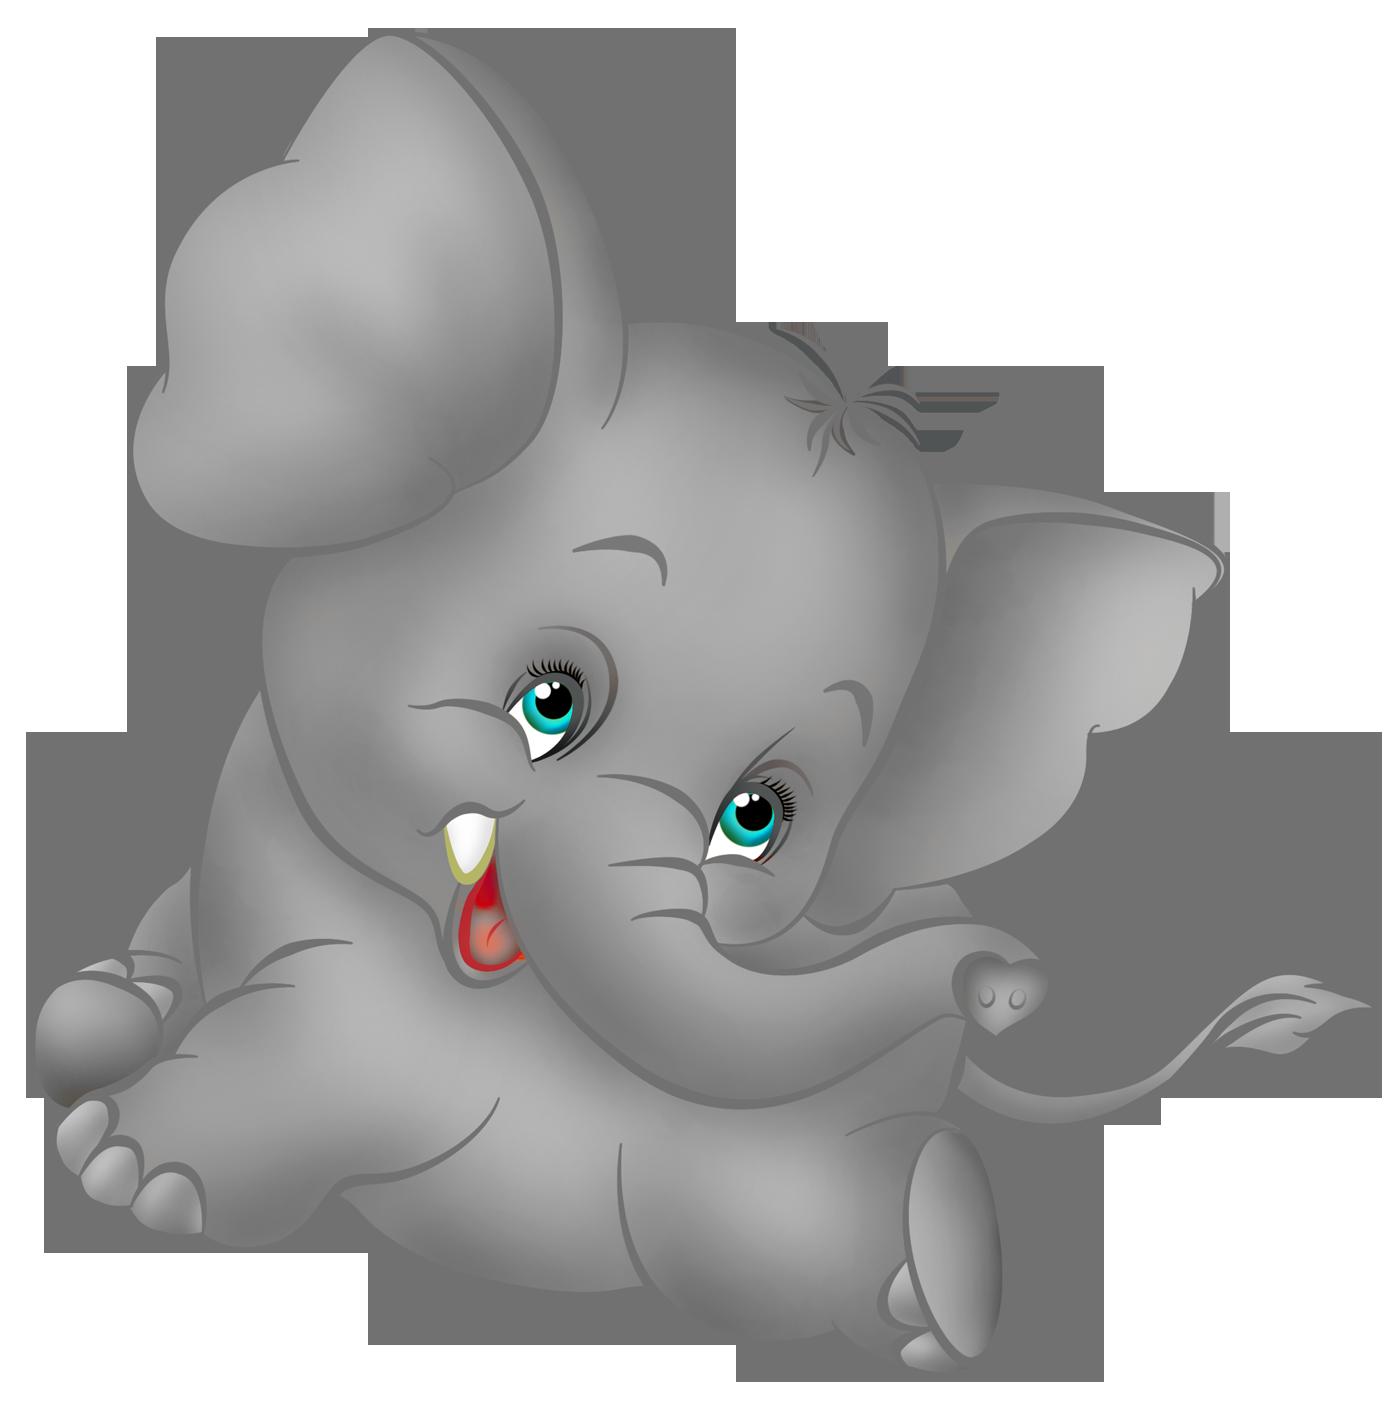 Cars 3 Full Movie Free >> Image - Elefante.png | Idea Wiki | FANDOM powered by Wikia